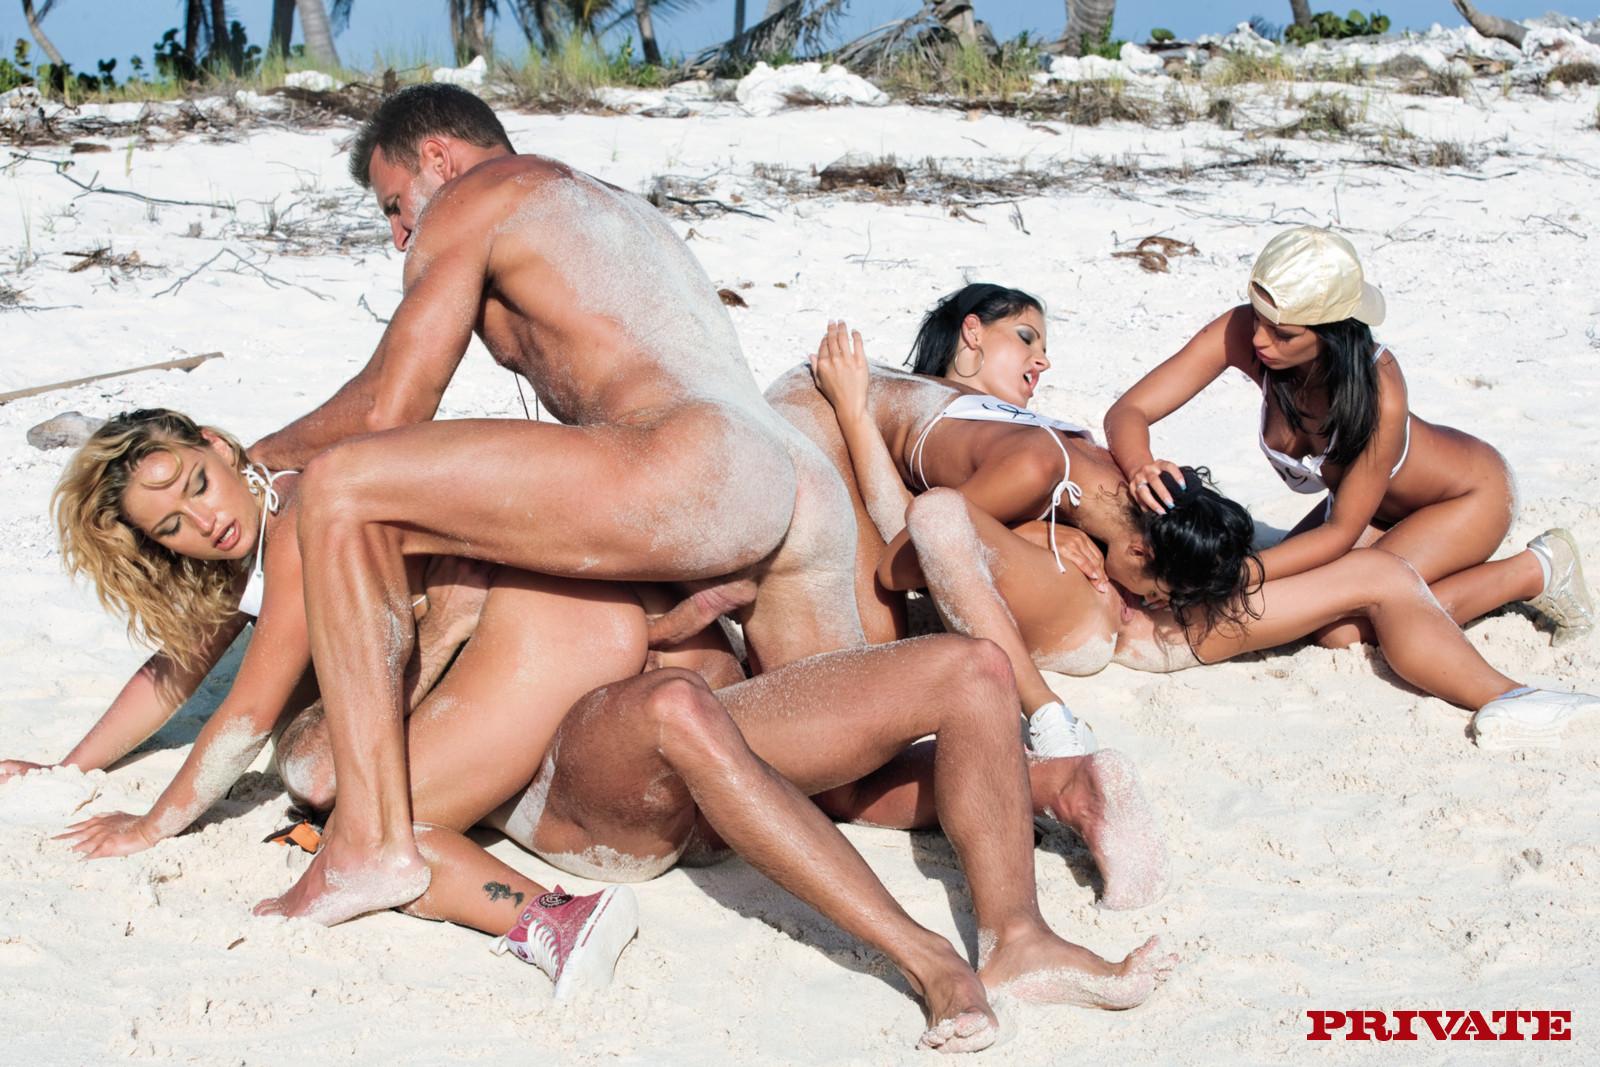 The blast of hot beach group sex pics